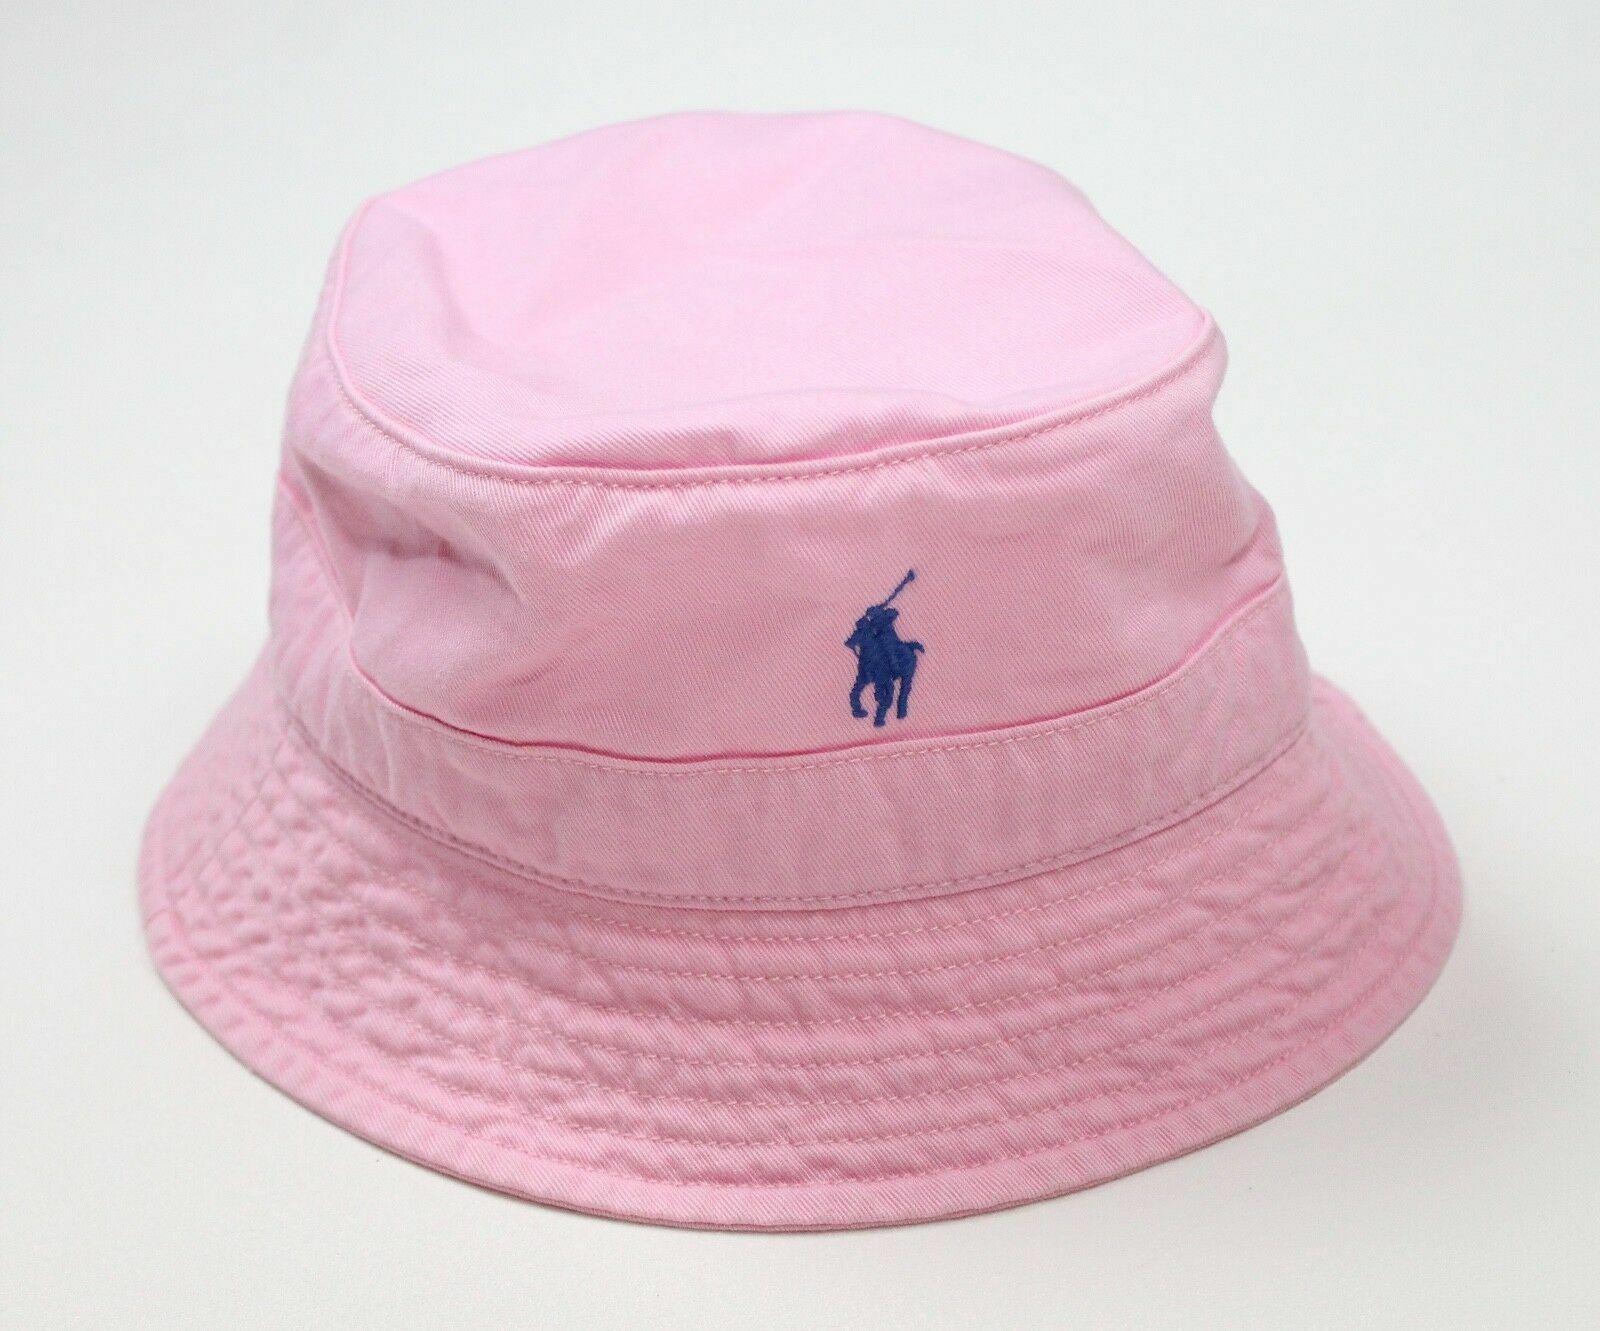 b012b4912d8 Polo Ralph Lauren Solid Pink Bucket Beach and 50 similar items